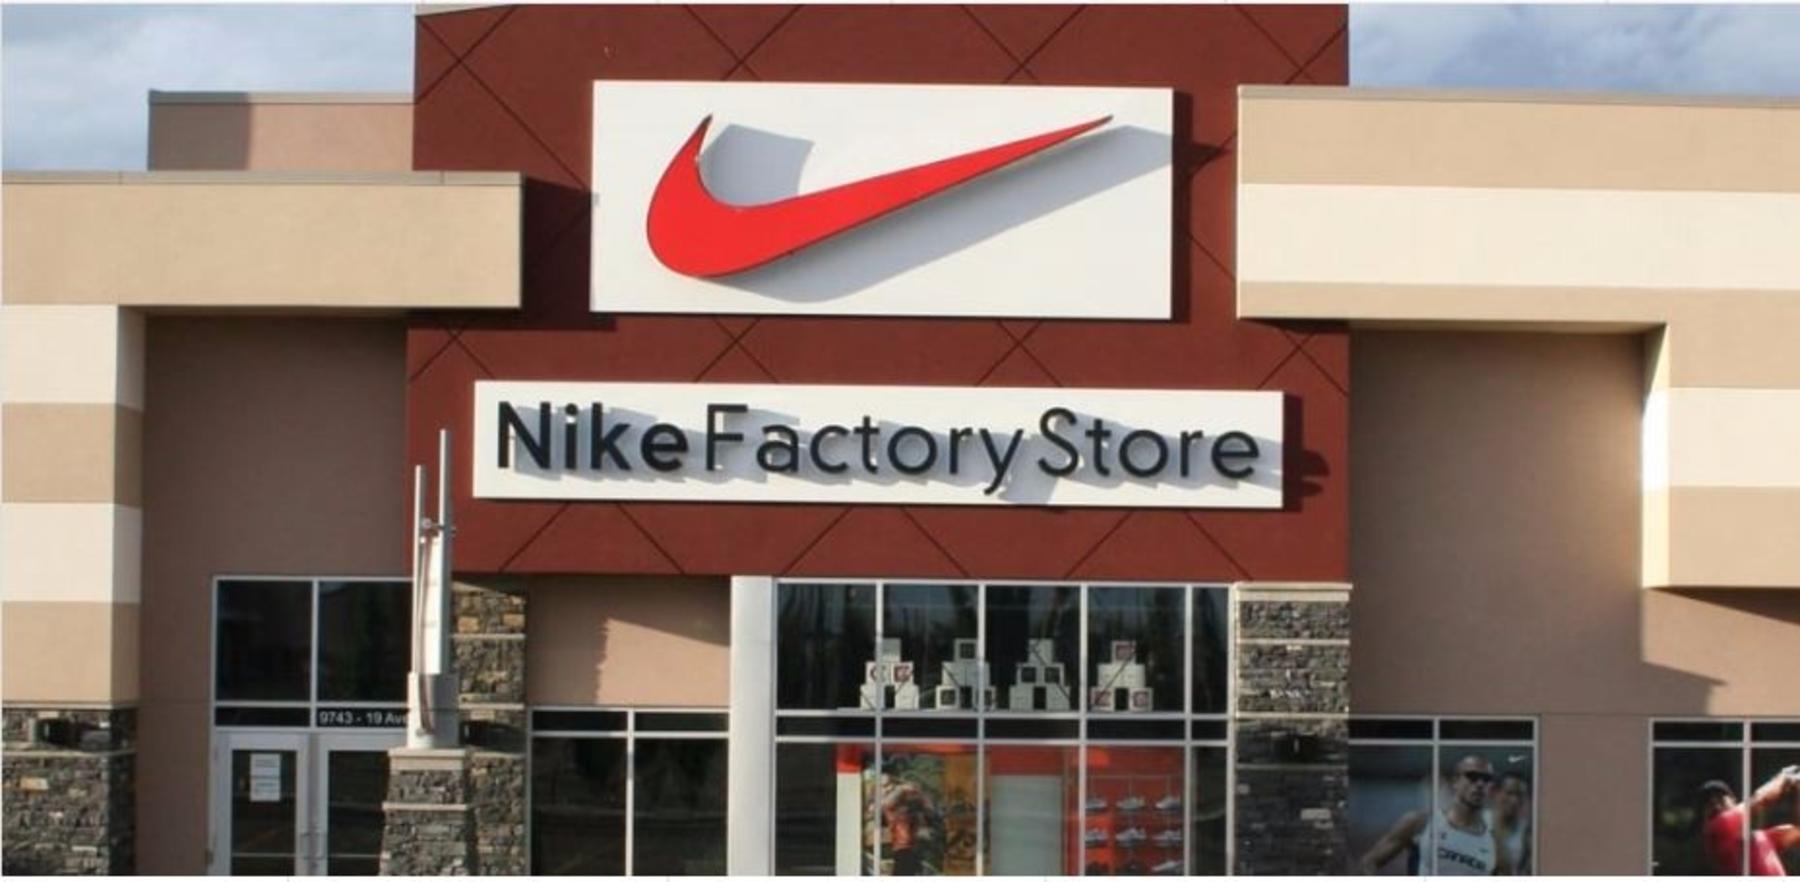 388a1def730b Nike Factory Store - Edmonton. Edmonton